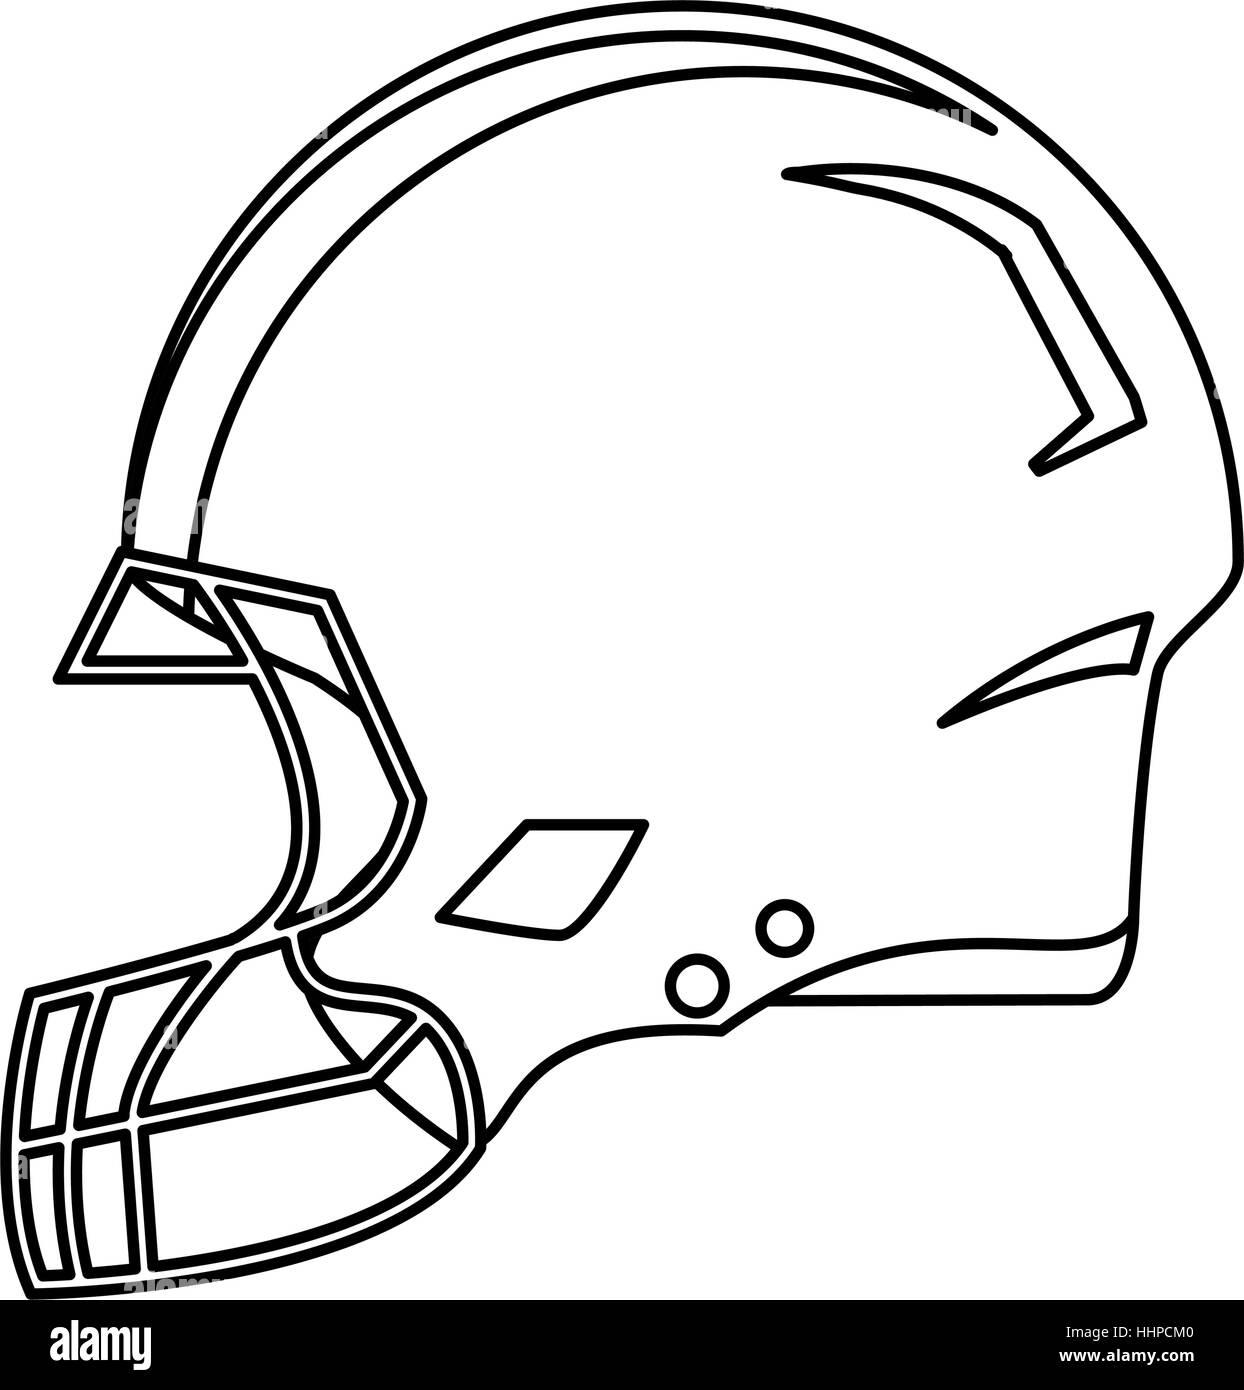 american football helmet protection outline stock vector art rh alamy com